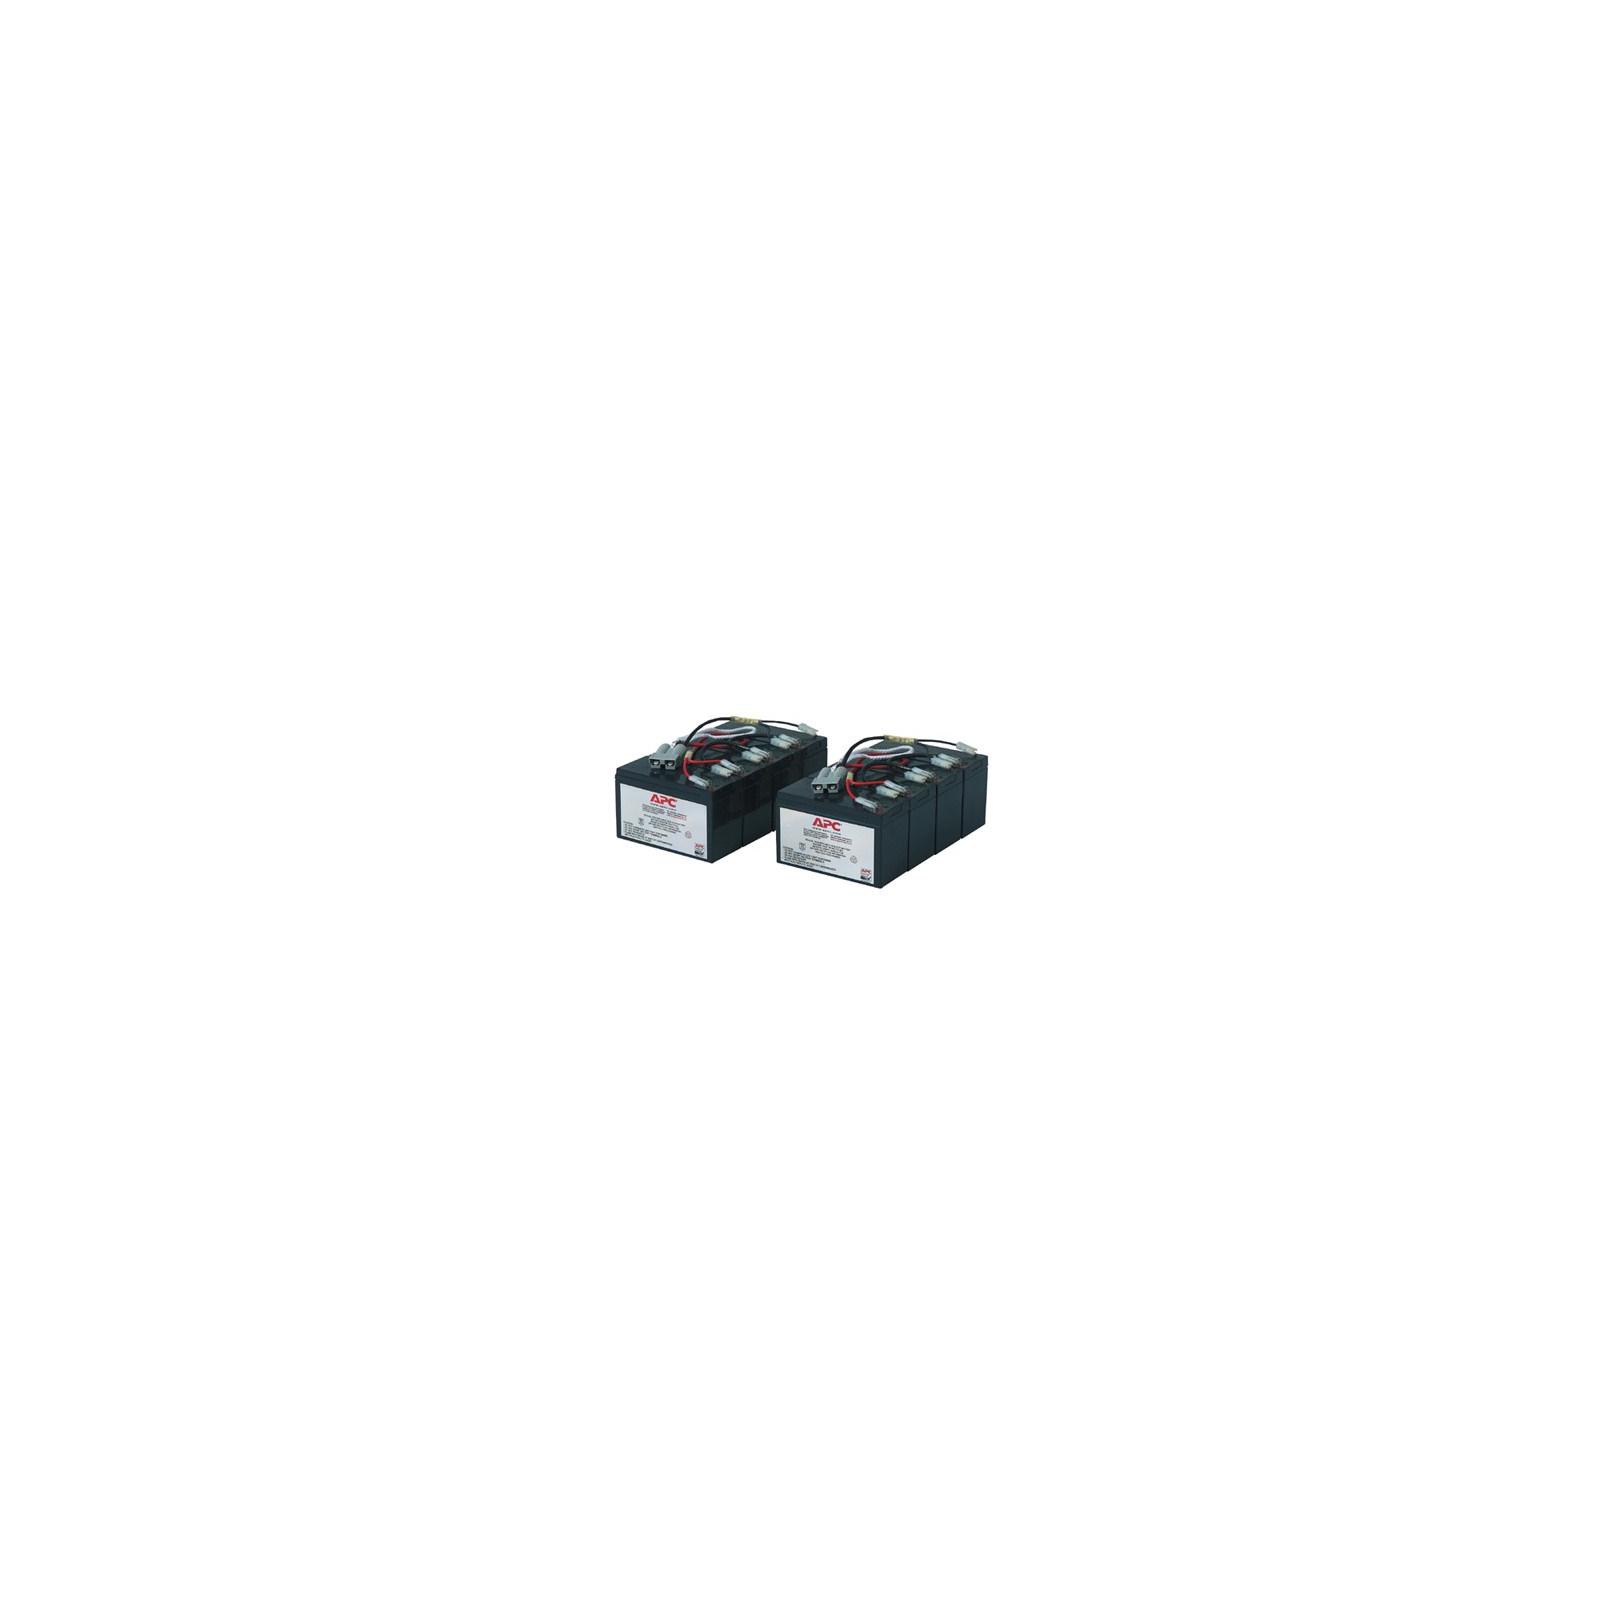 Батарея к ИБП Replacement Battery Cartridge #12 APC (RBC12)